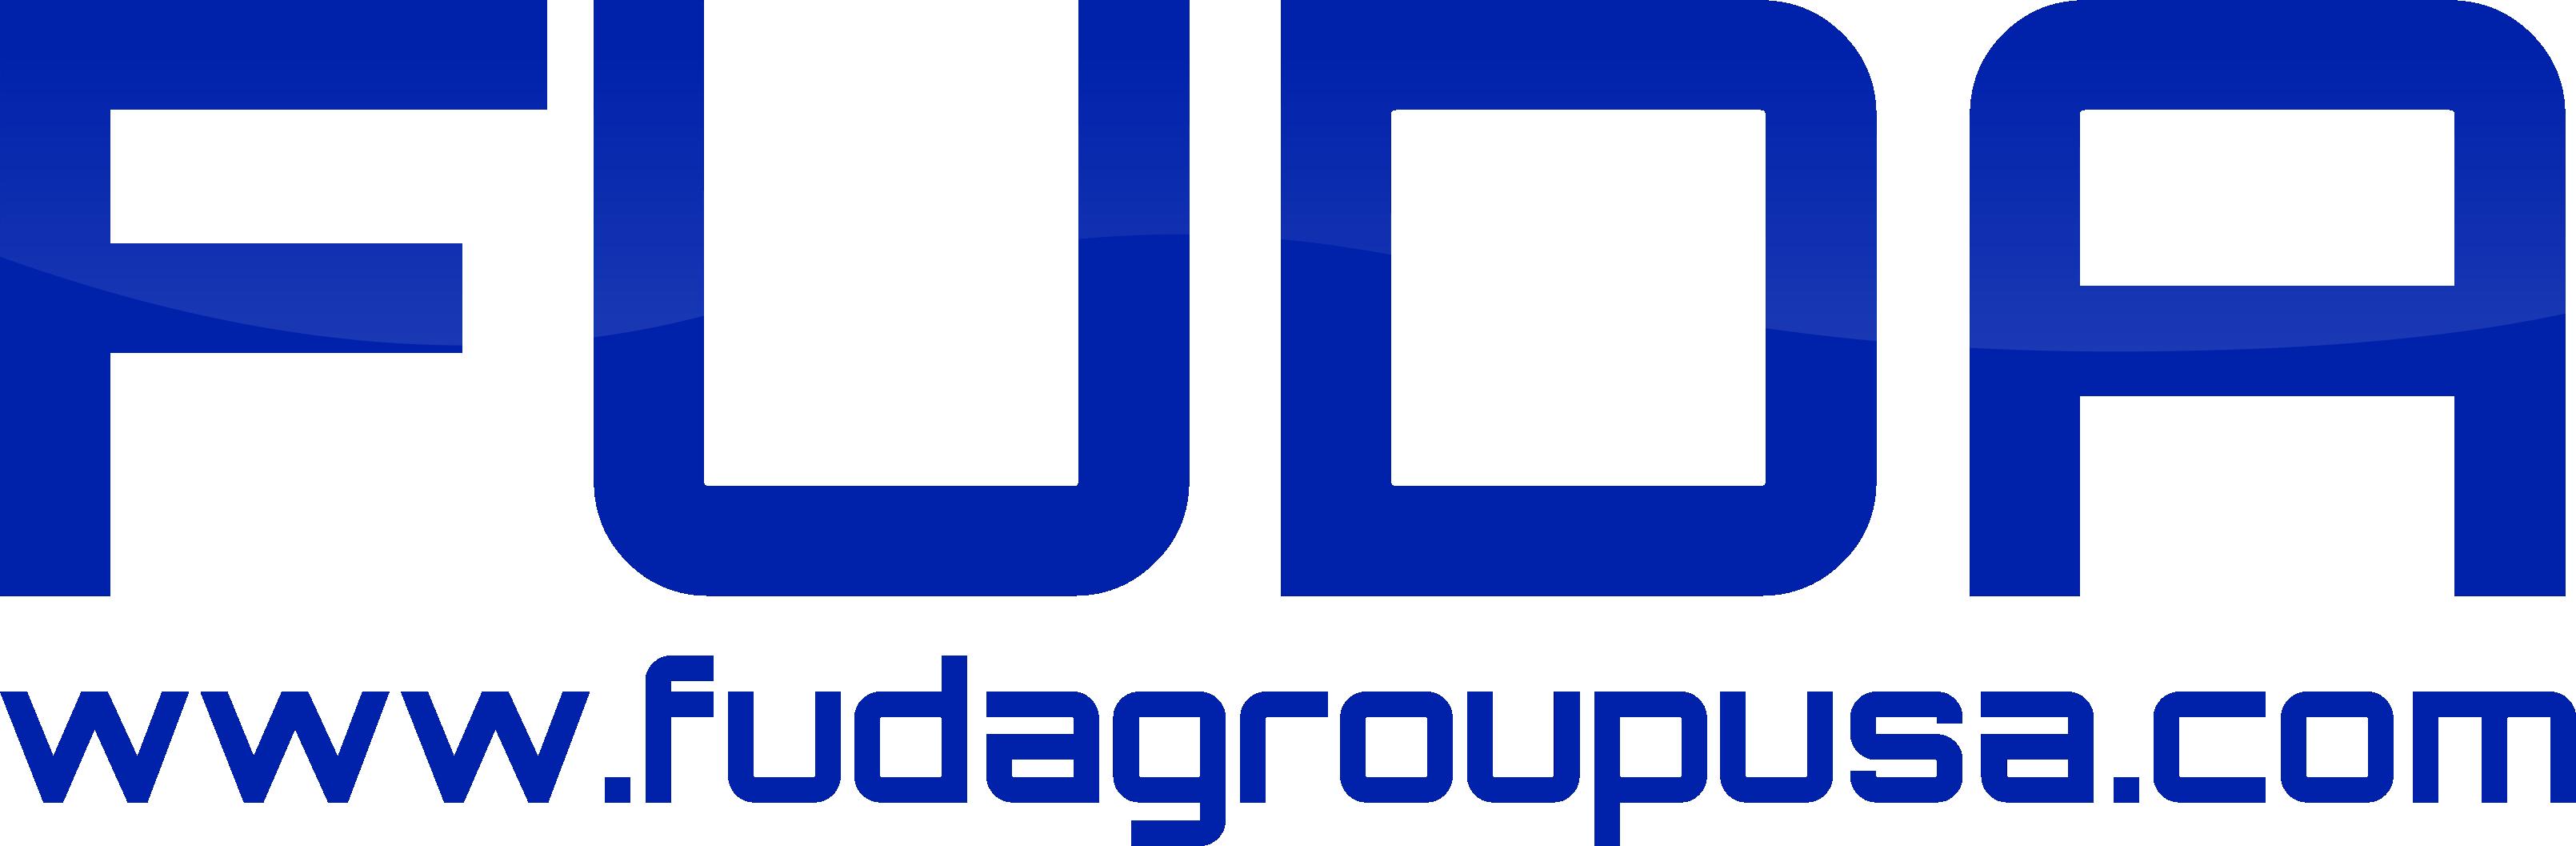 Fuda Group (USA) Corporation